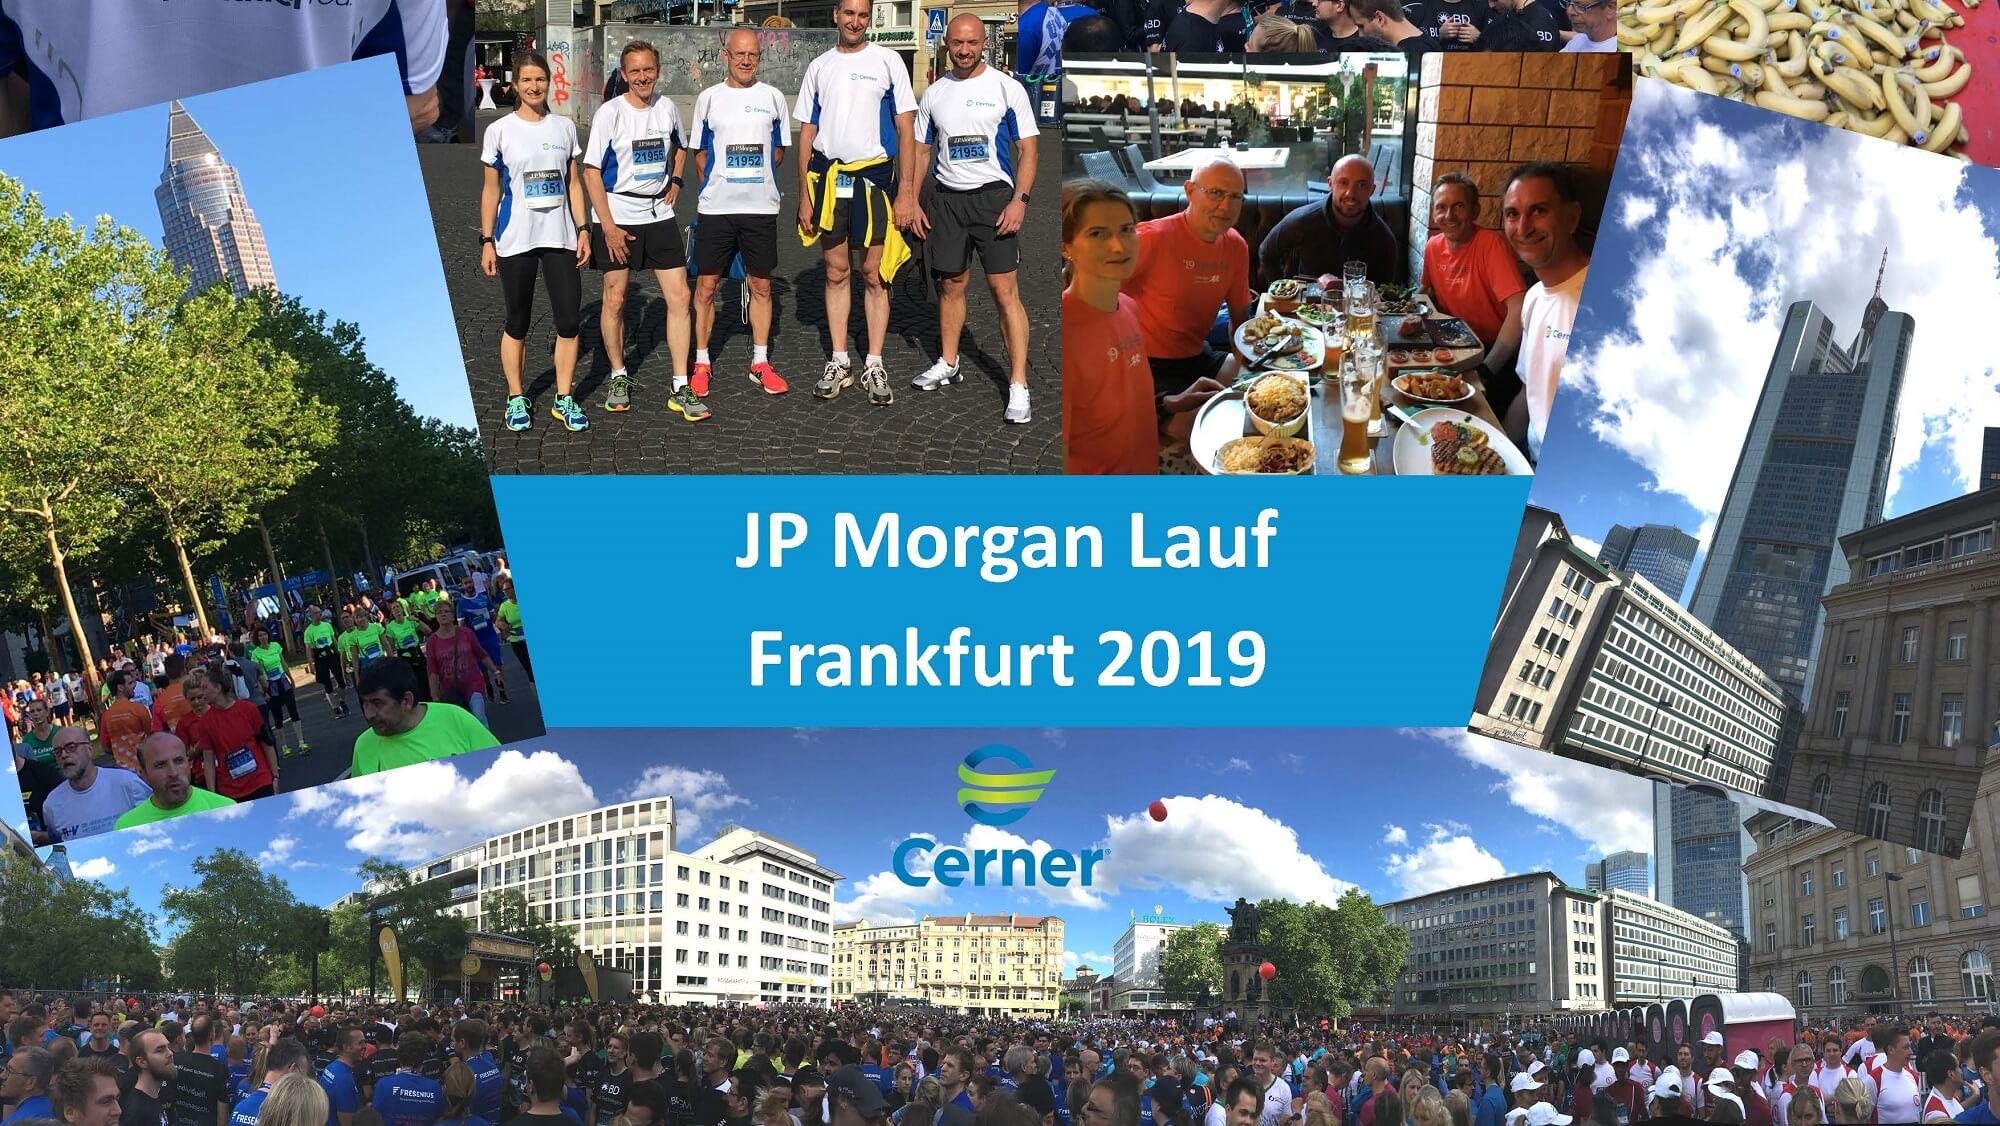 J.P. Morgan Corporate Challenge Lauf 2019 in Frankfurt